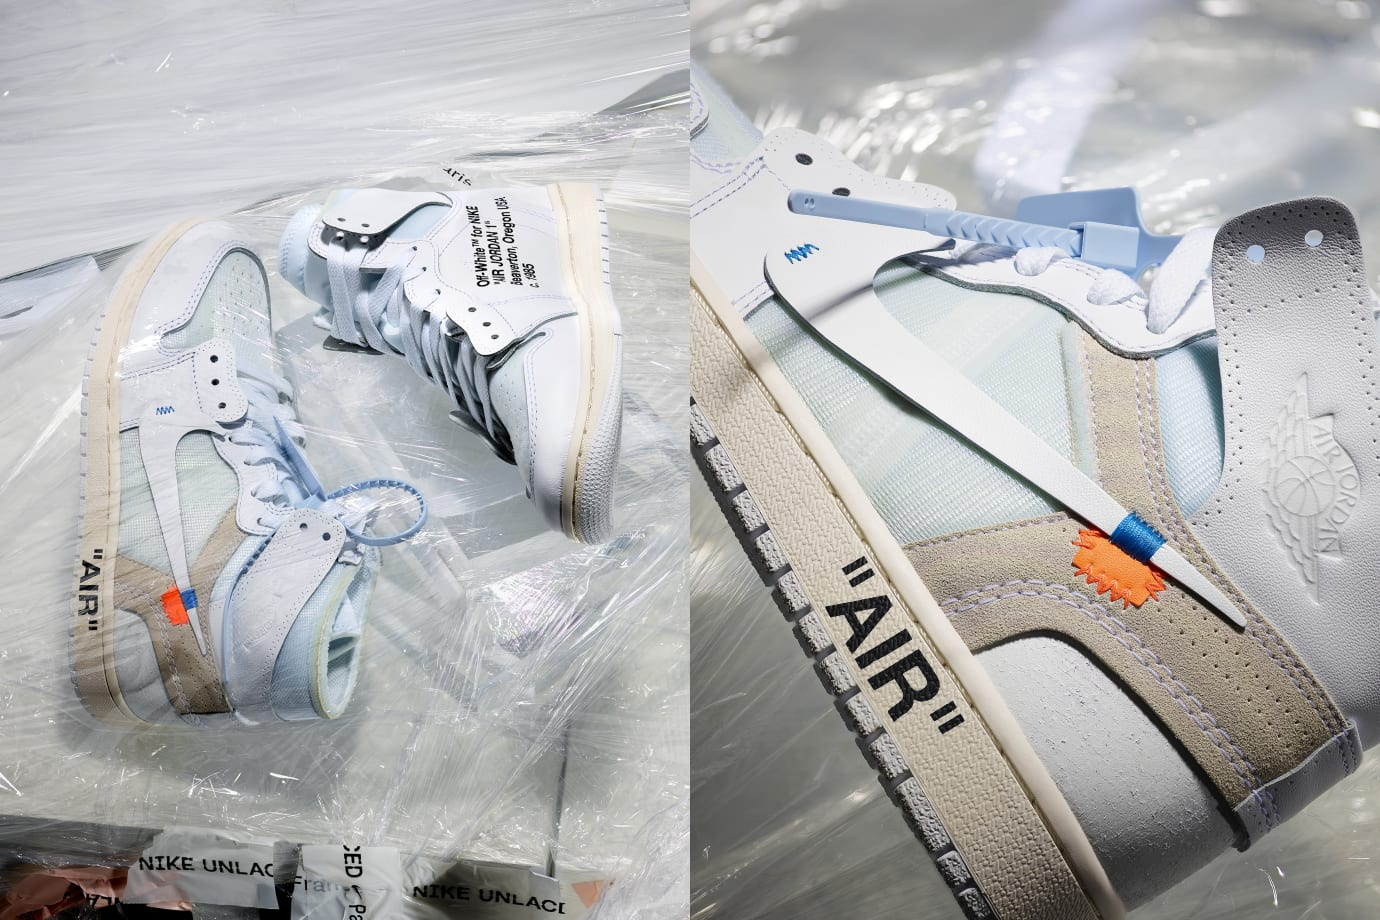 Nike Unlaced 4